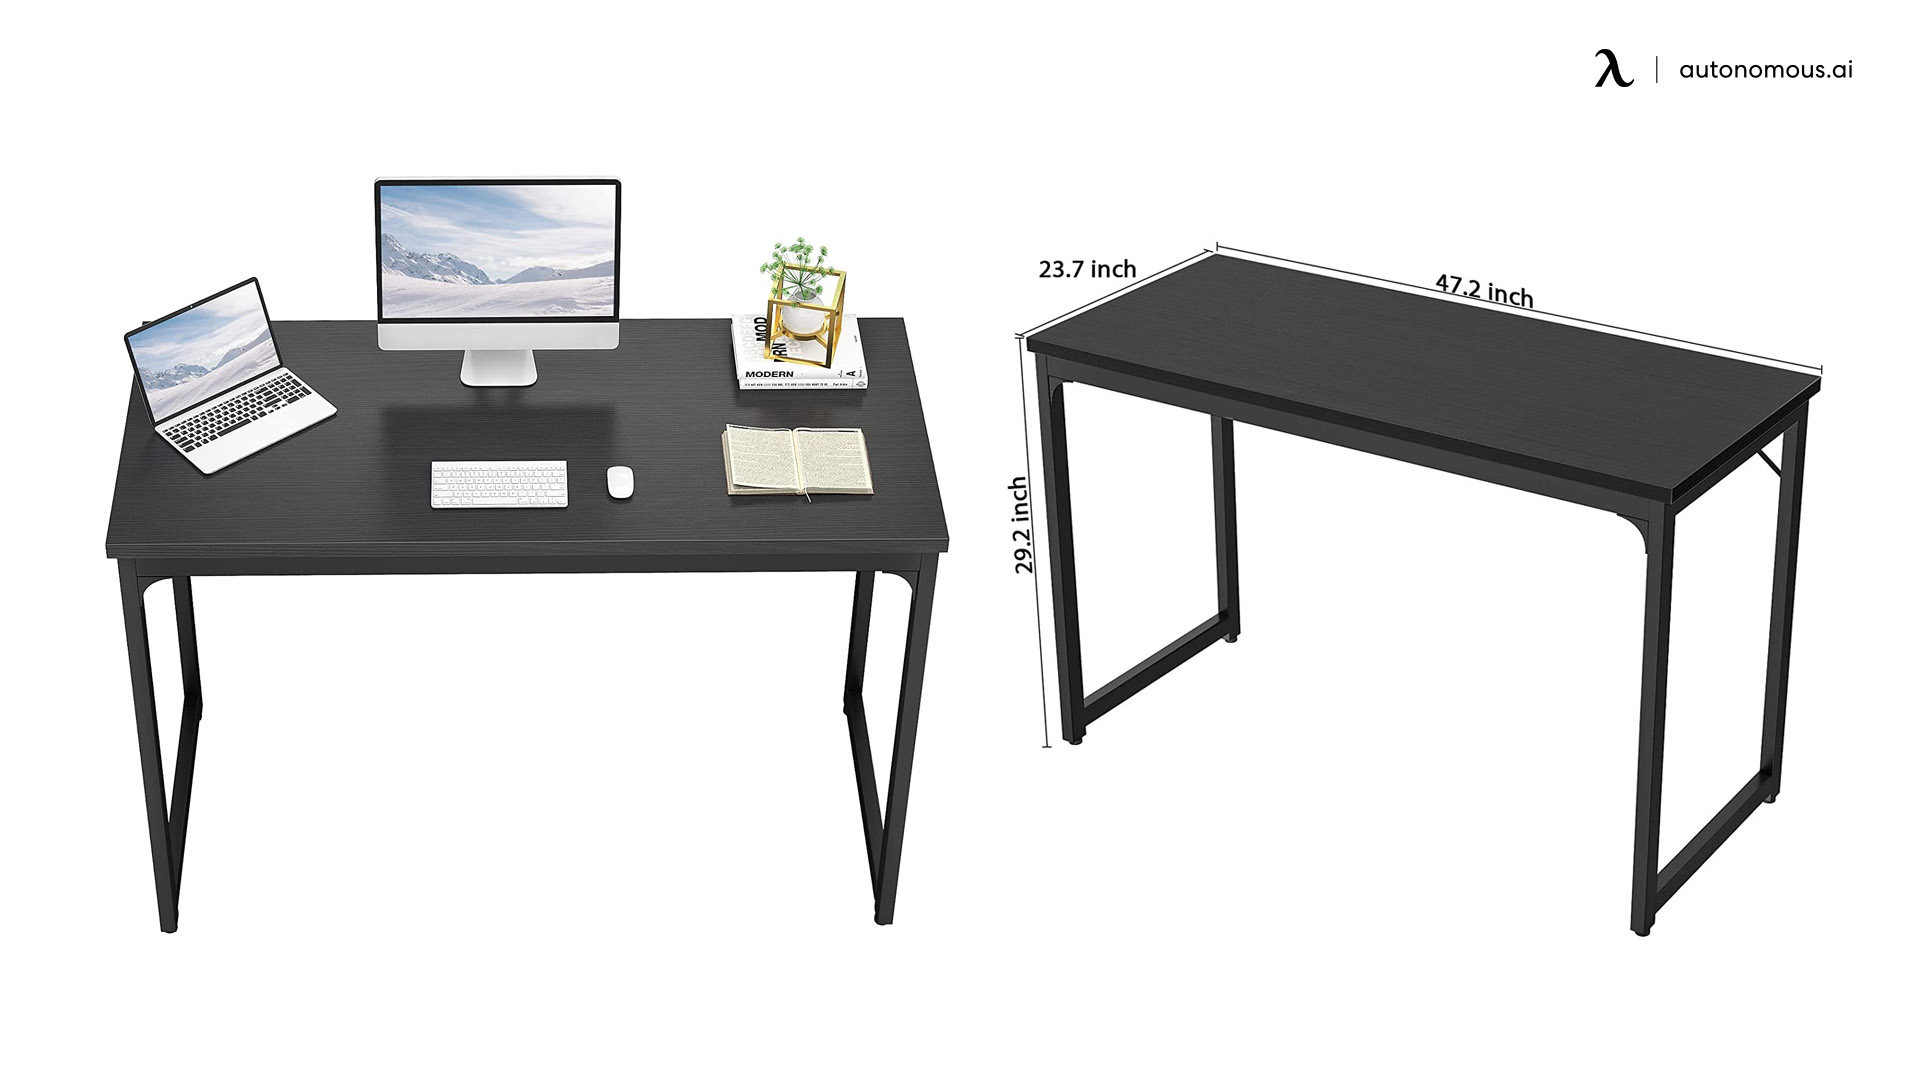 Foxemart Treste Black Computer Desk